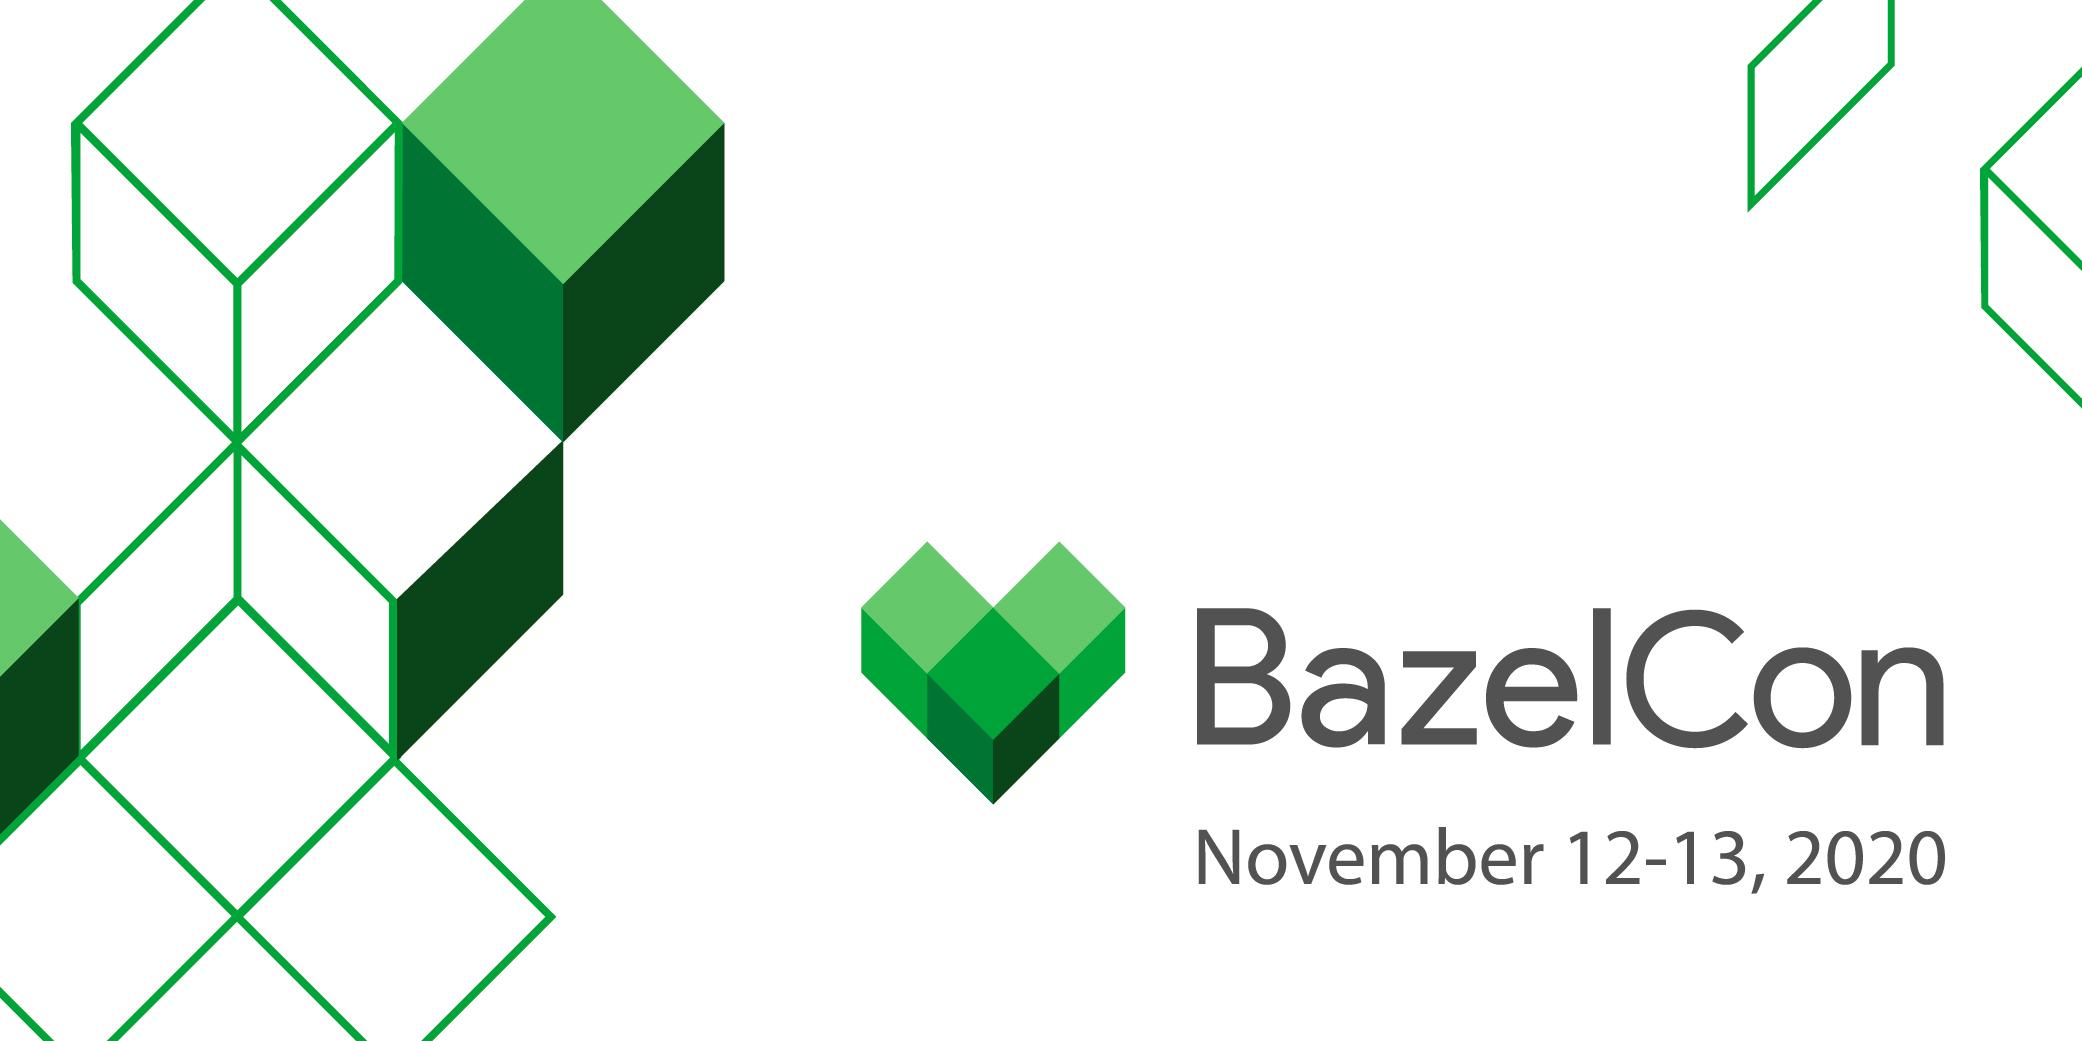 BazelCon 2020 image